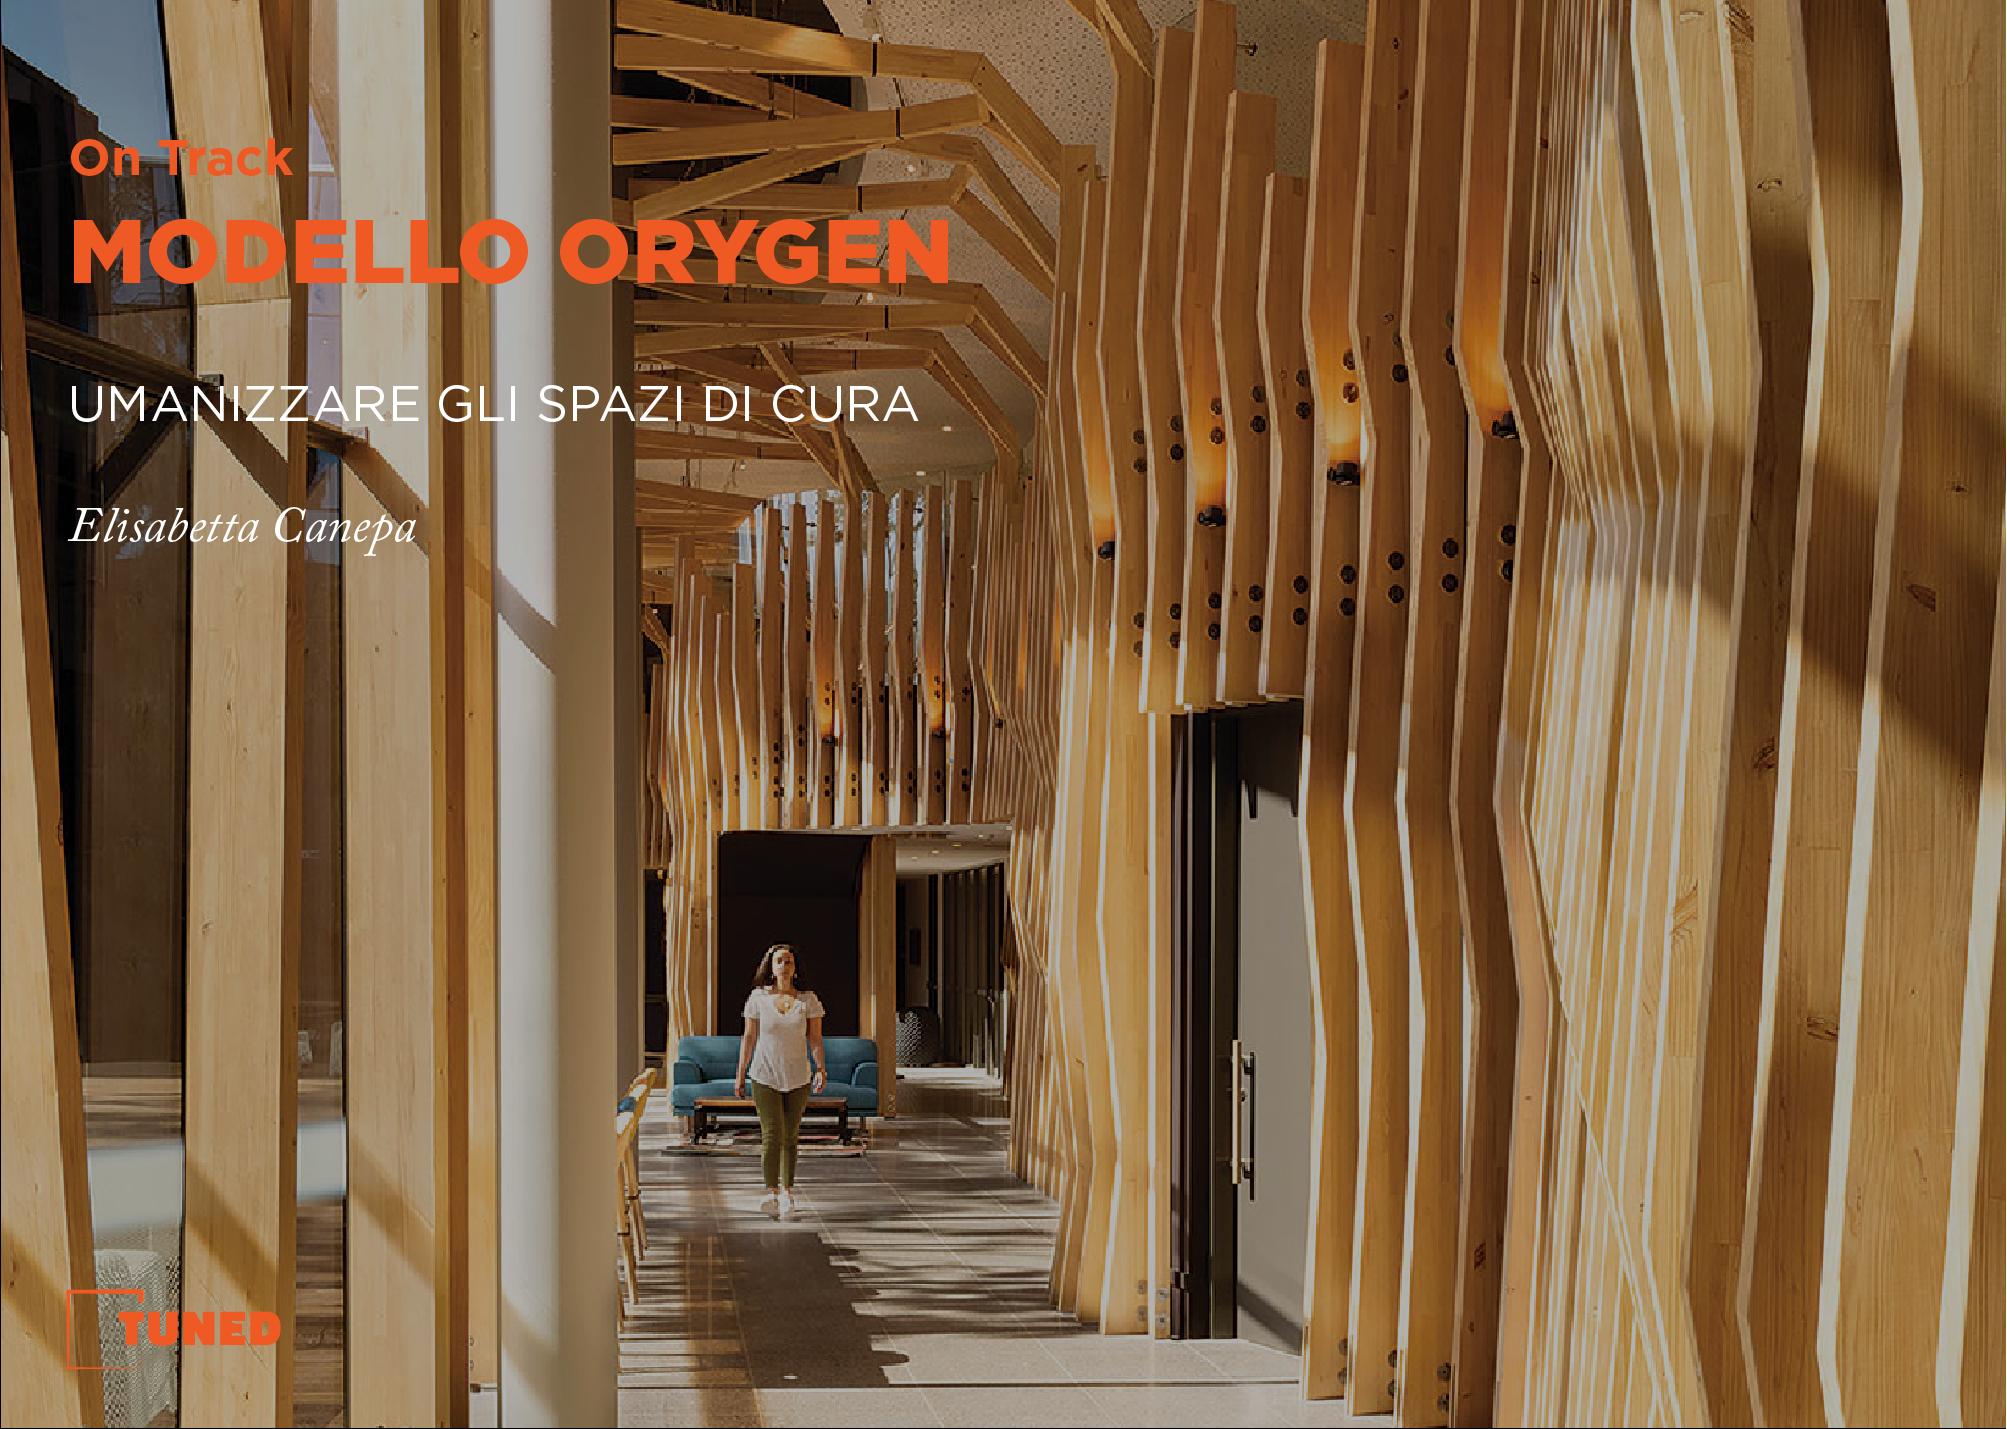 Modello Orygen - Cover ITA BLOG